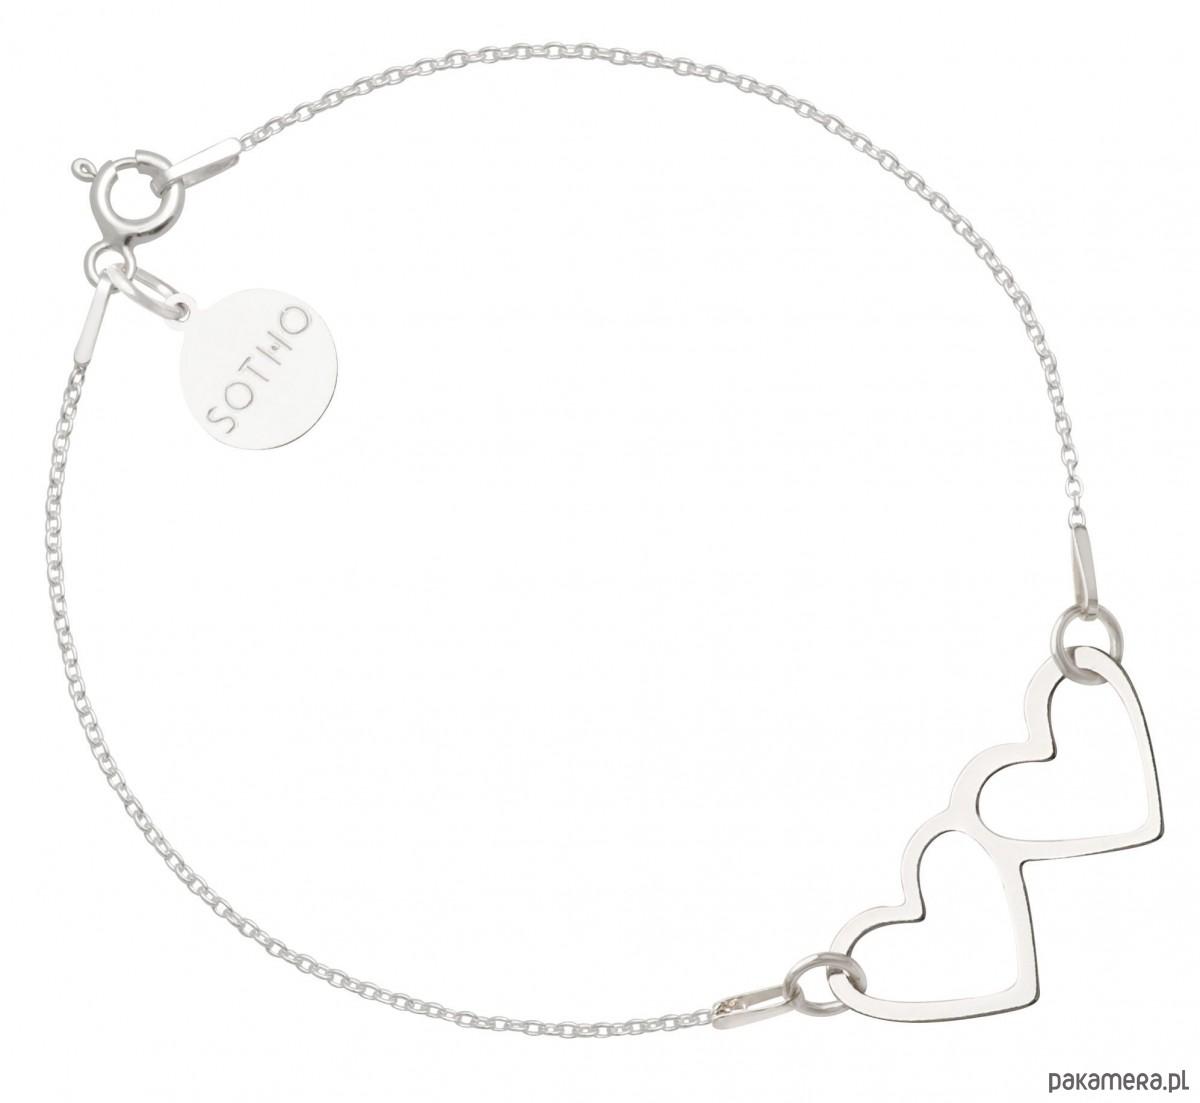 Chwalebne Srebrna bransoletka z dwoma serduszkami srebro - bransoletki OW01